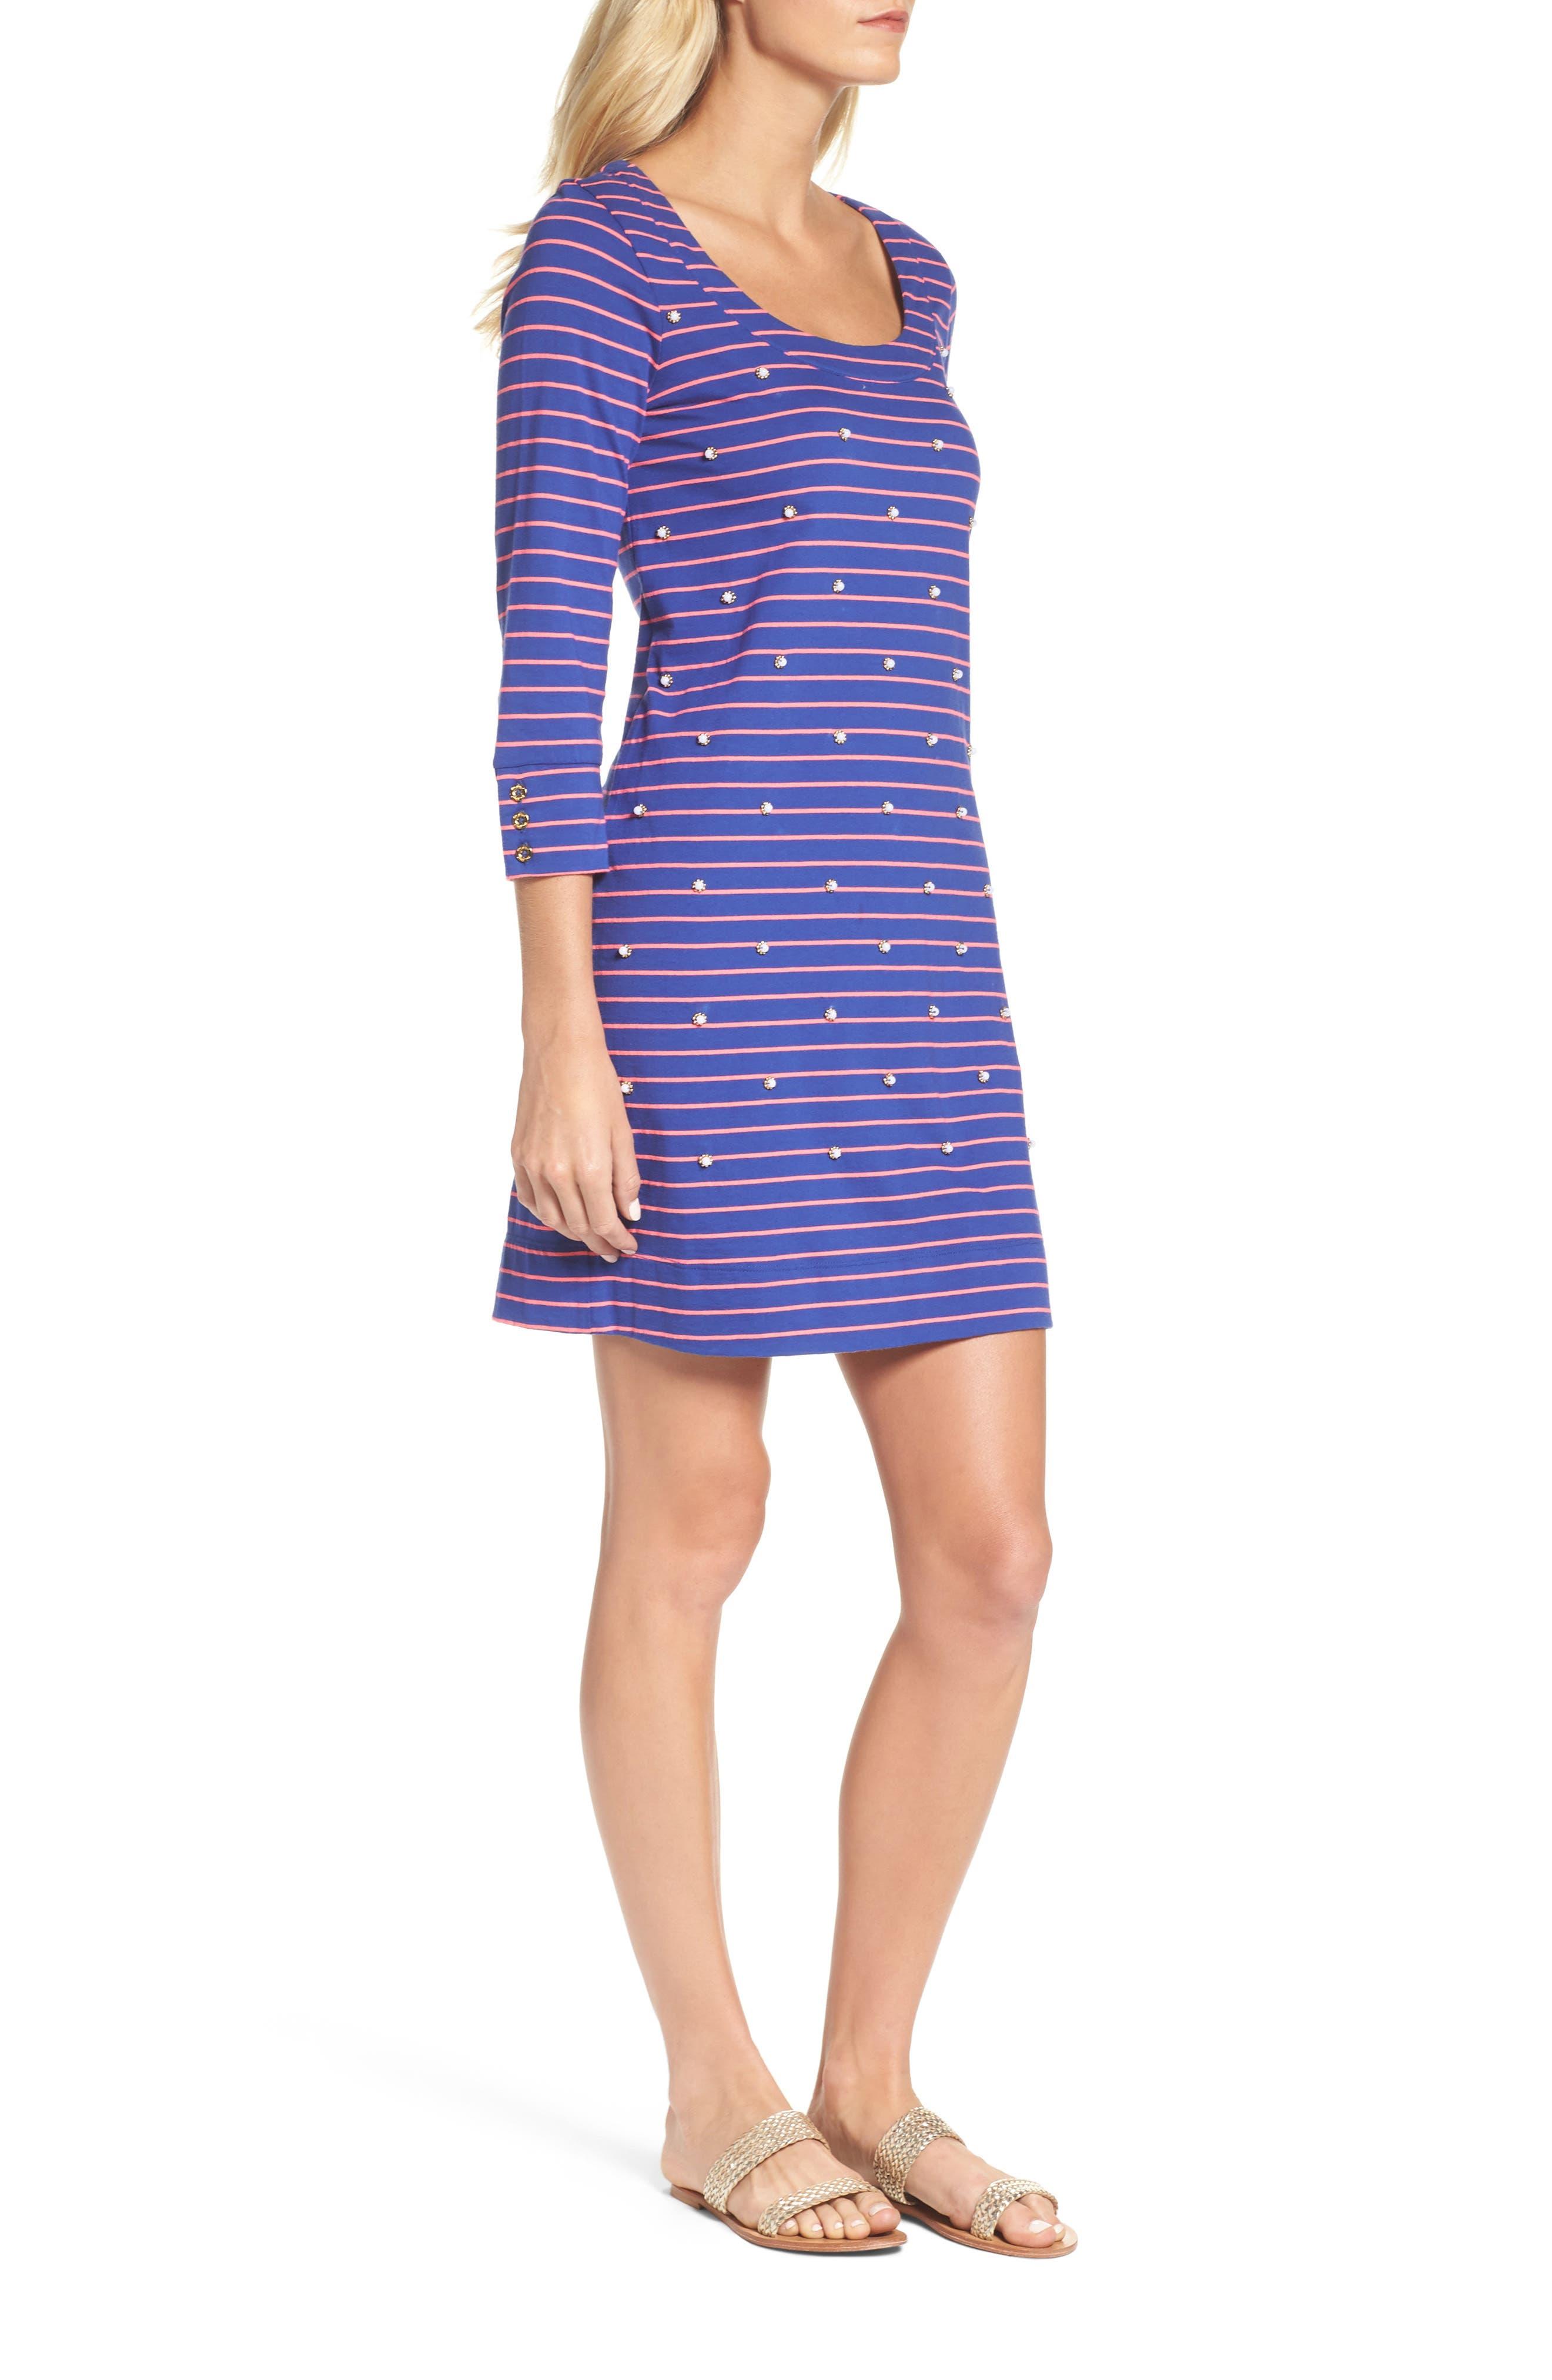 Merrit Beaded T-Shirt Dress,                             Alternate thumbnail 3, color,